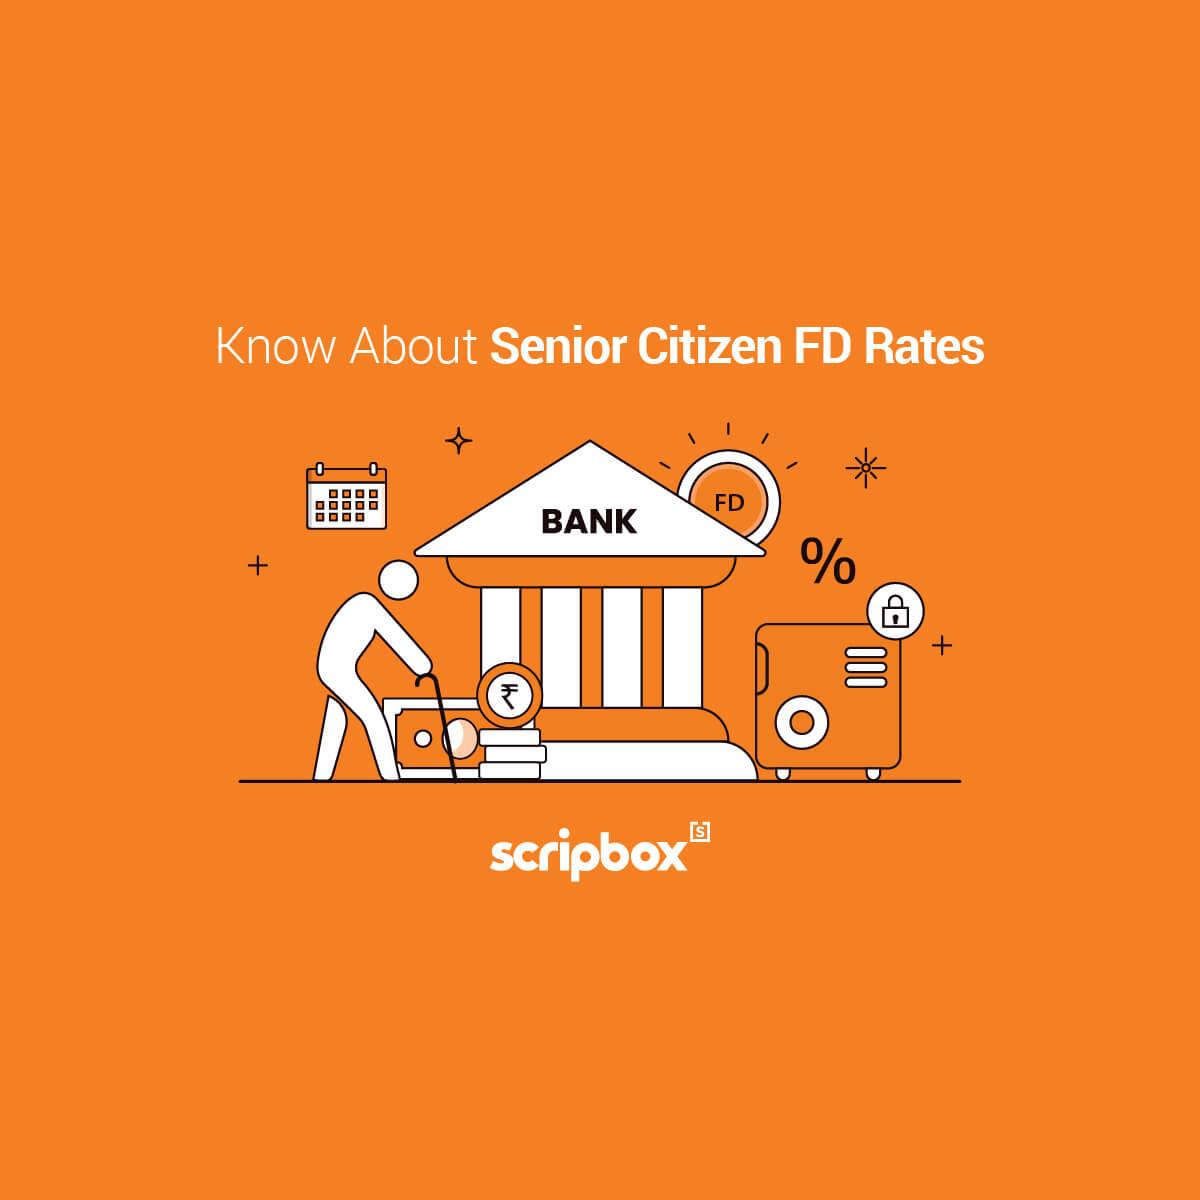 Senior Citizen FD Rates